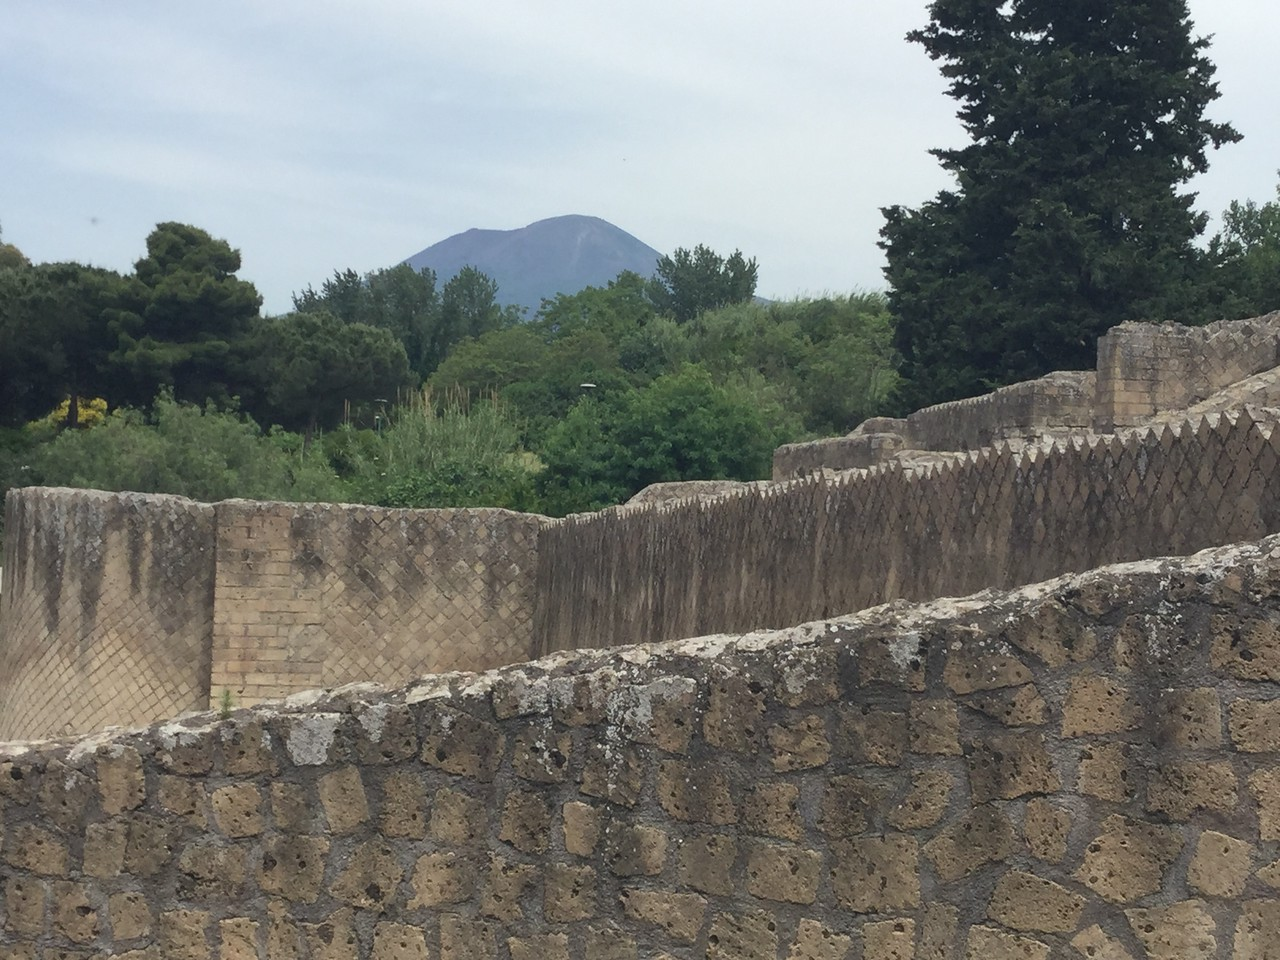 Top of Vesuvius